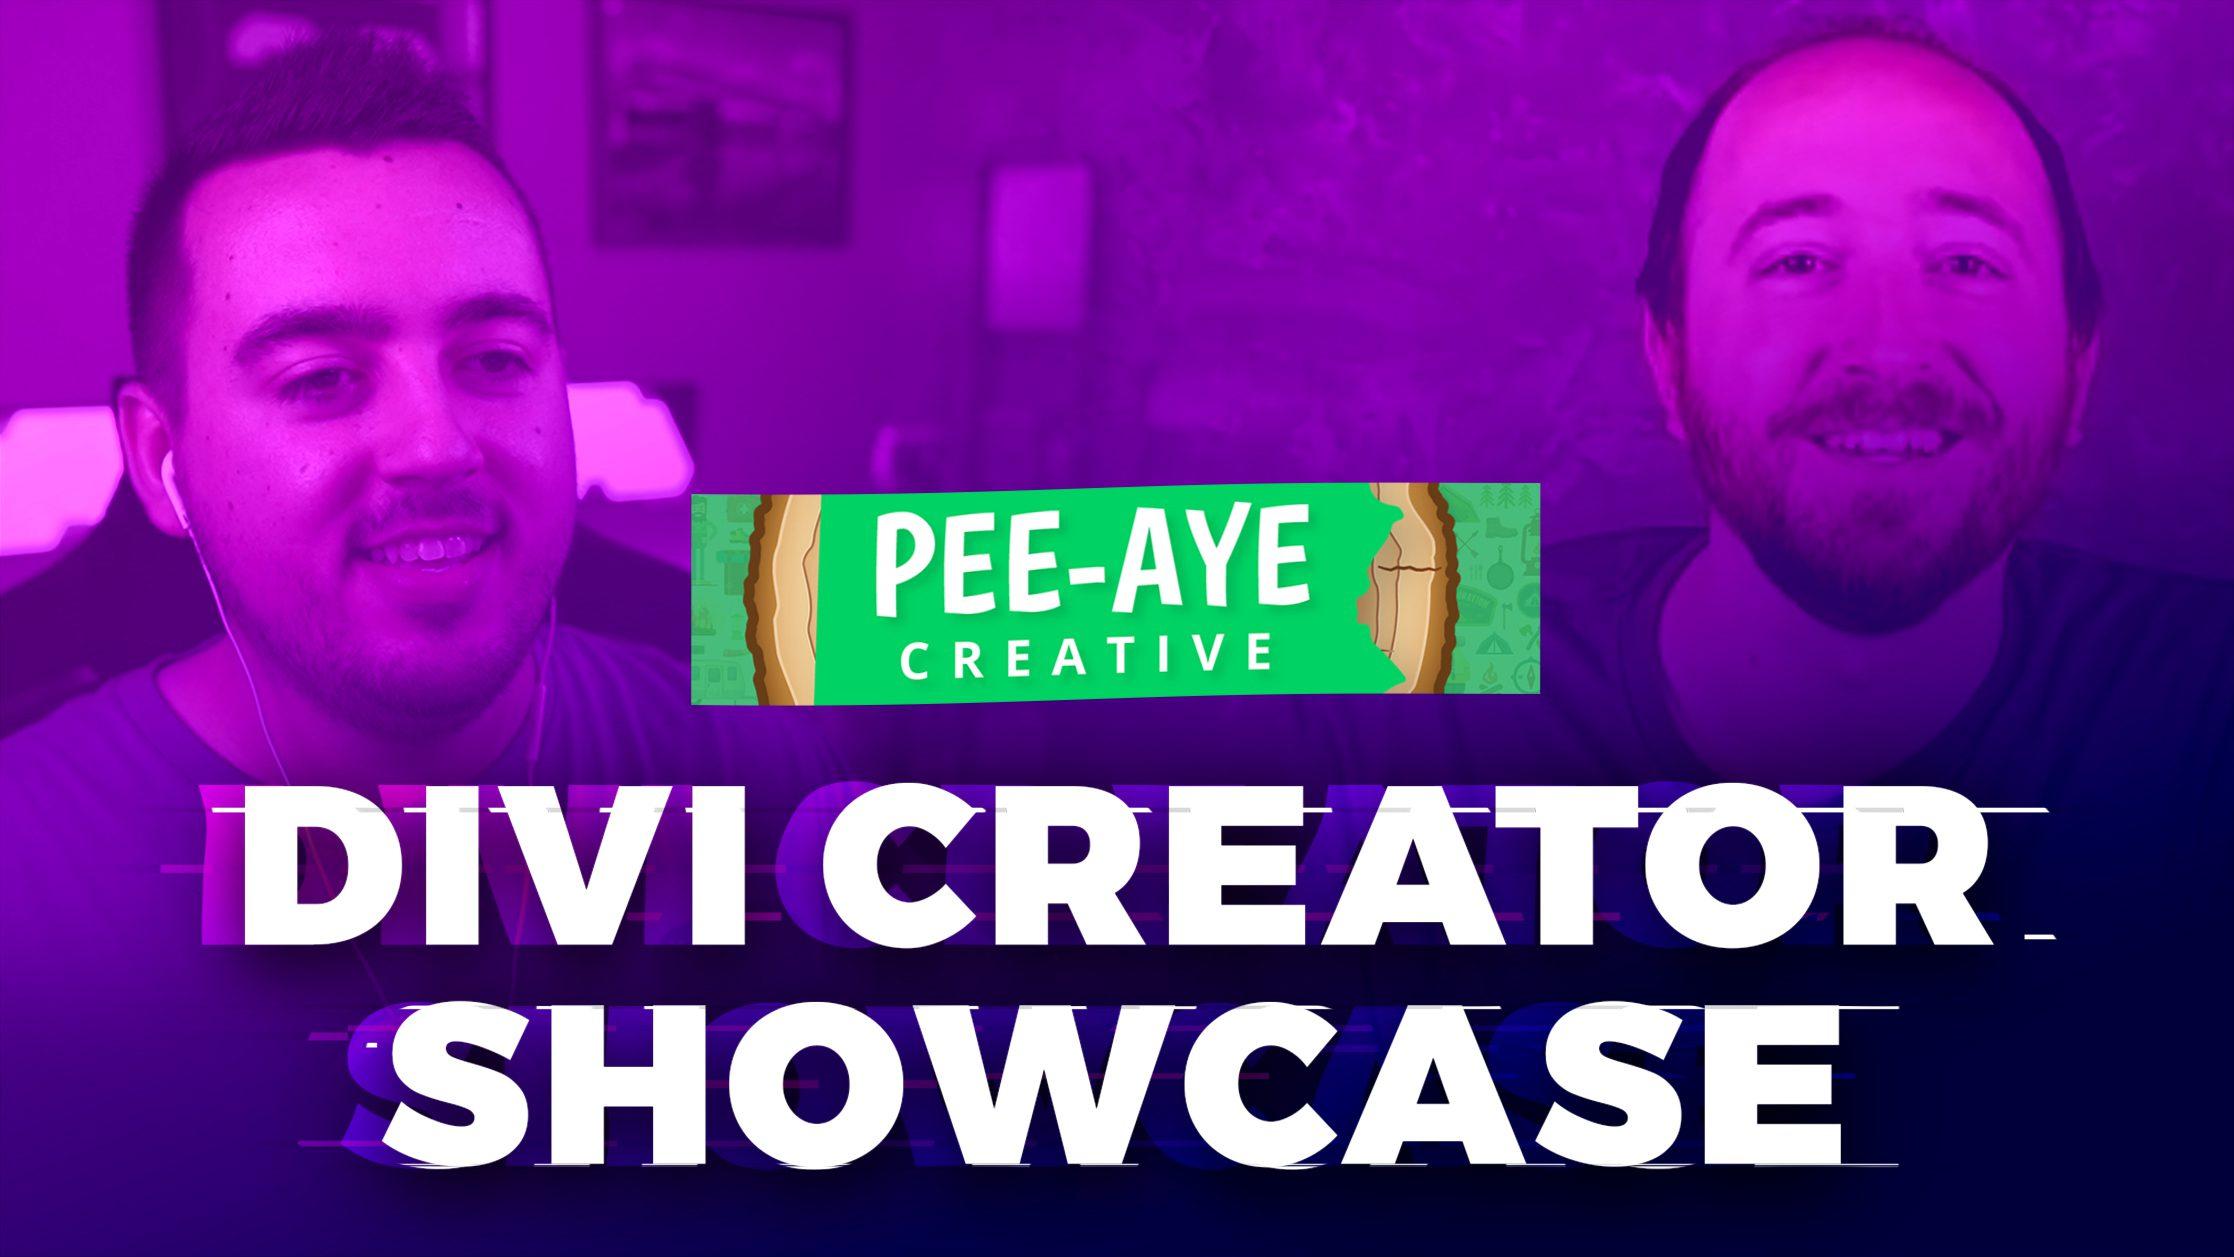 Divi Creator Showcase: Pee-Aye Creative